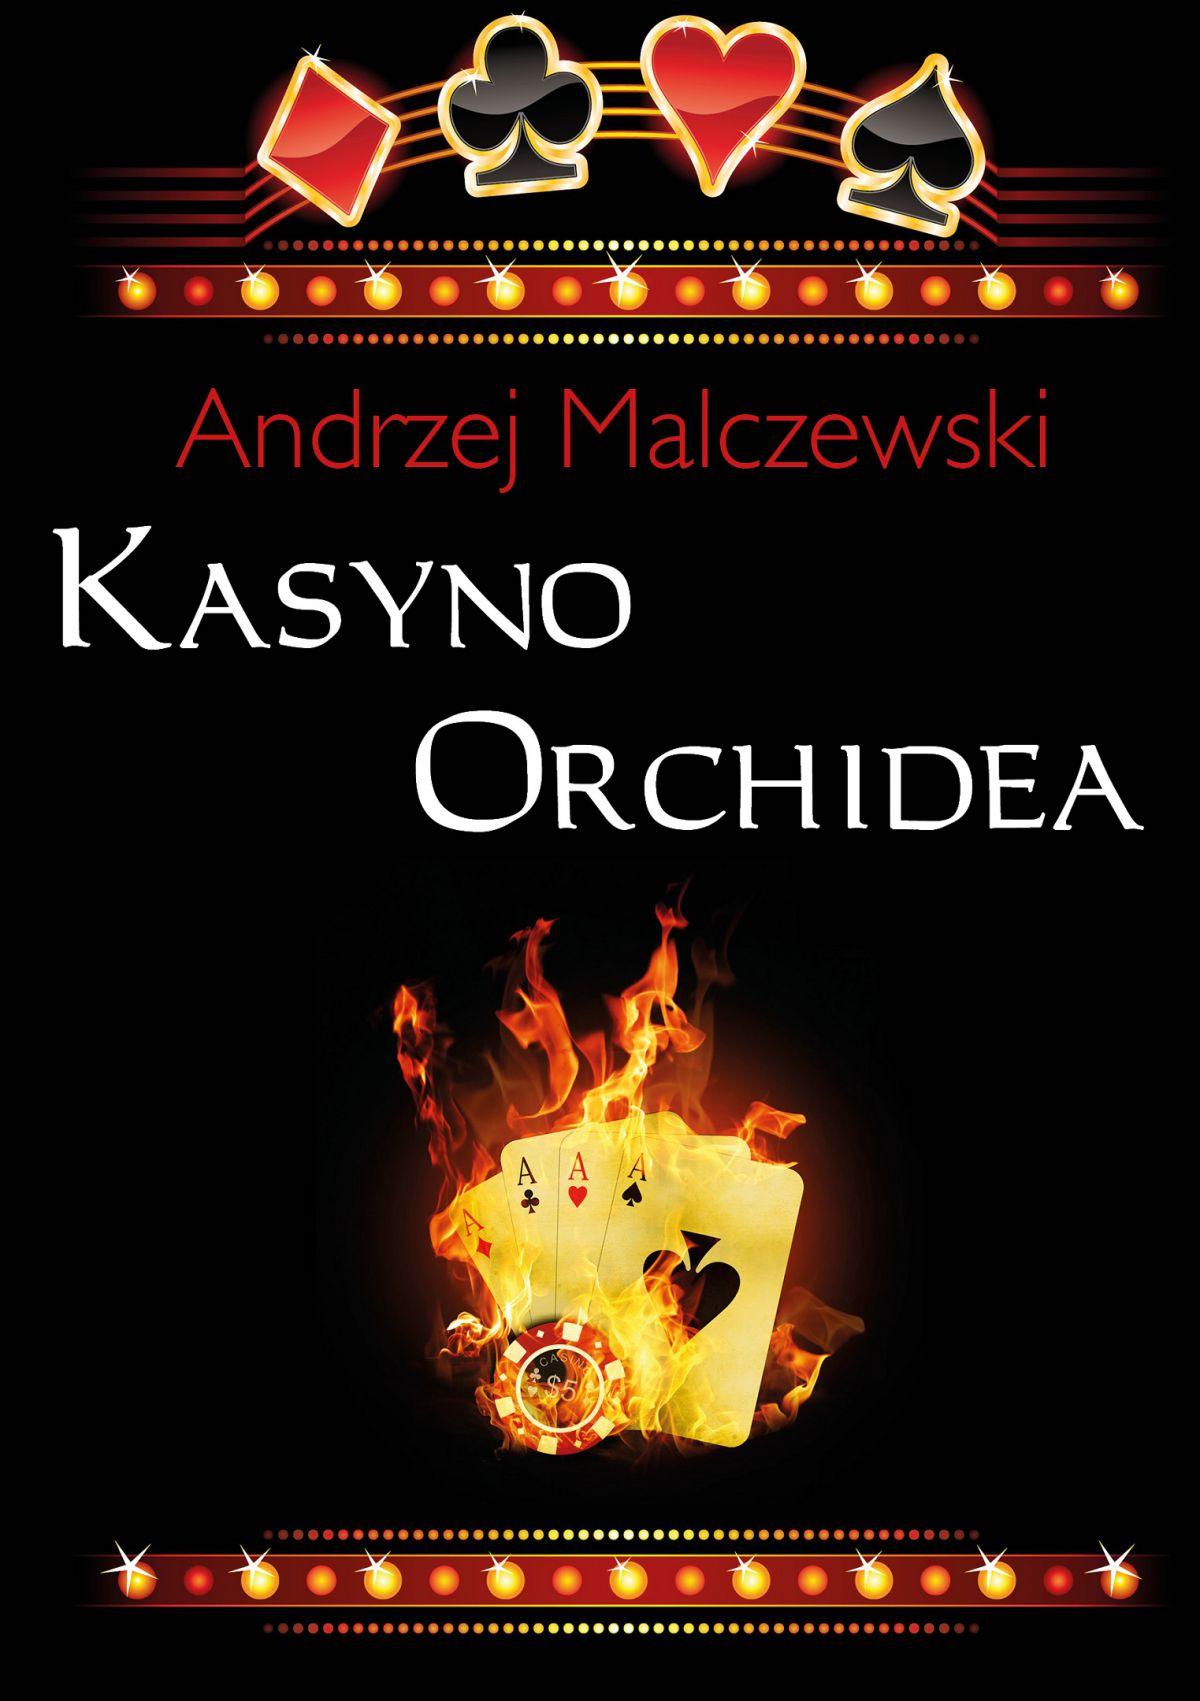 Kasyno Orchidea - Ebook (Książka PDF) do pobrania w formacie PDF